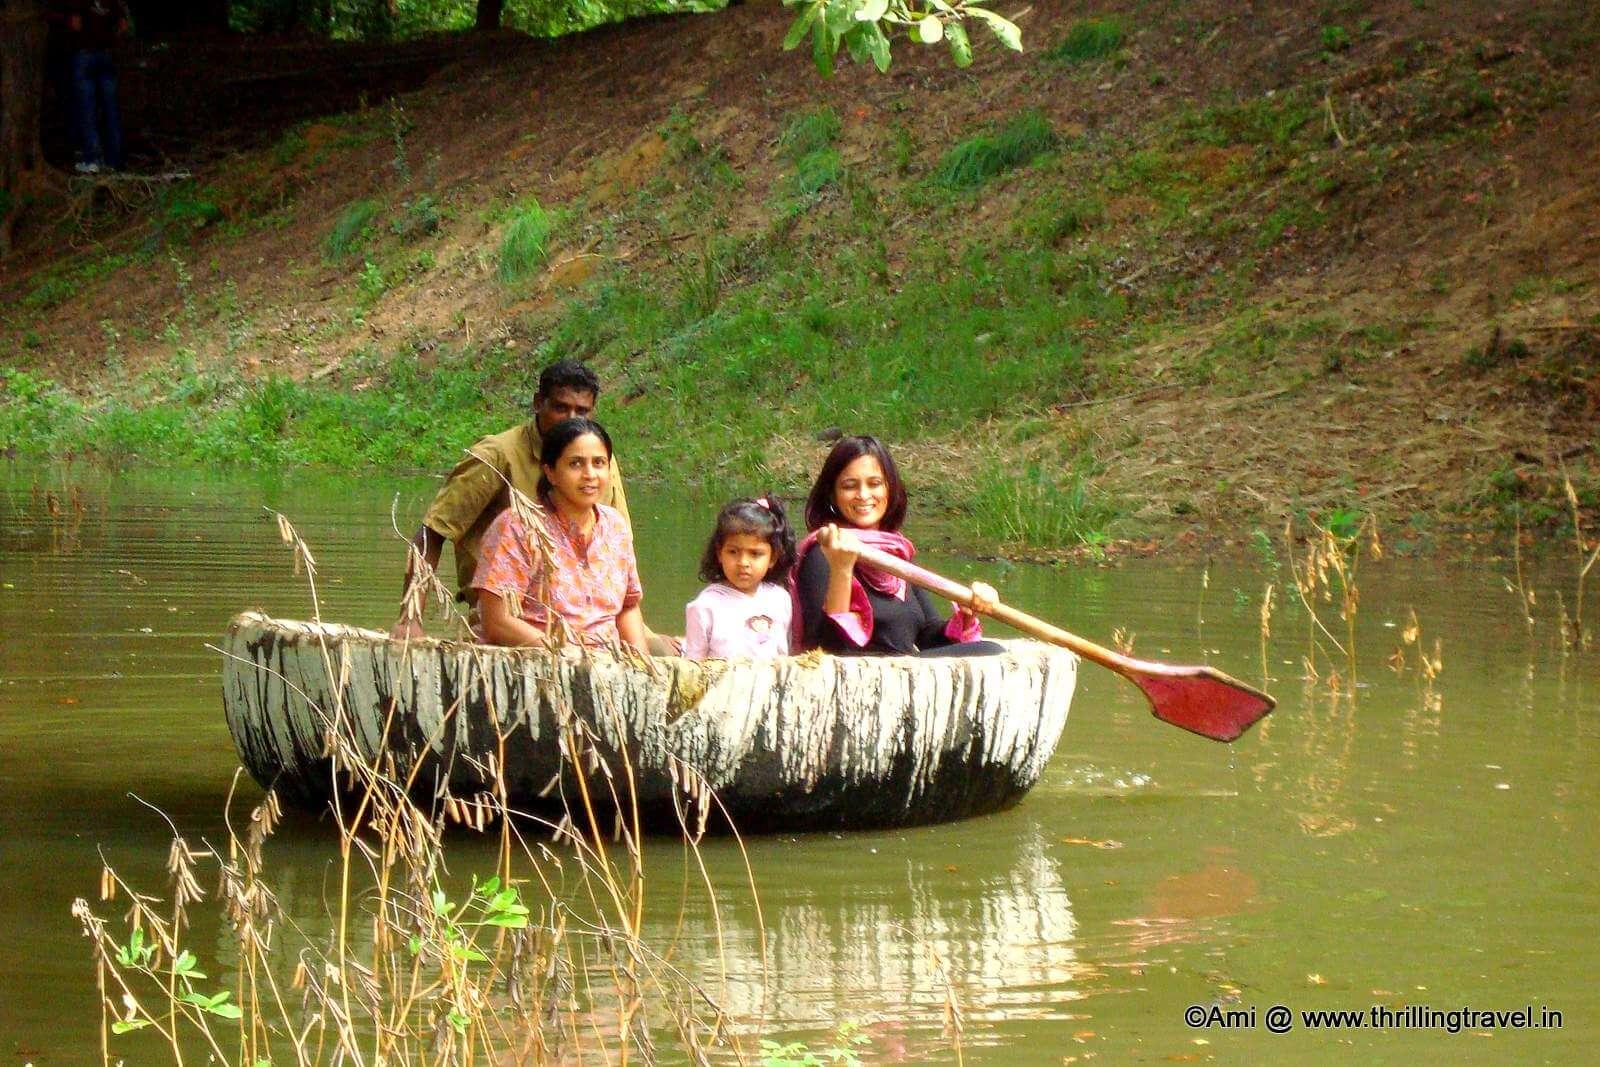 Coracle Ride at Bheemeshwari Nature Camp